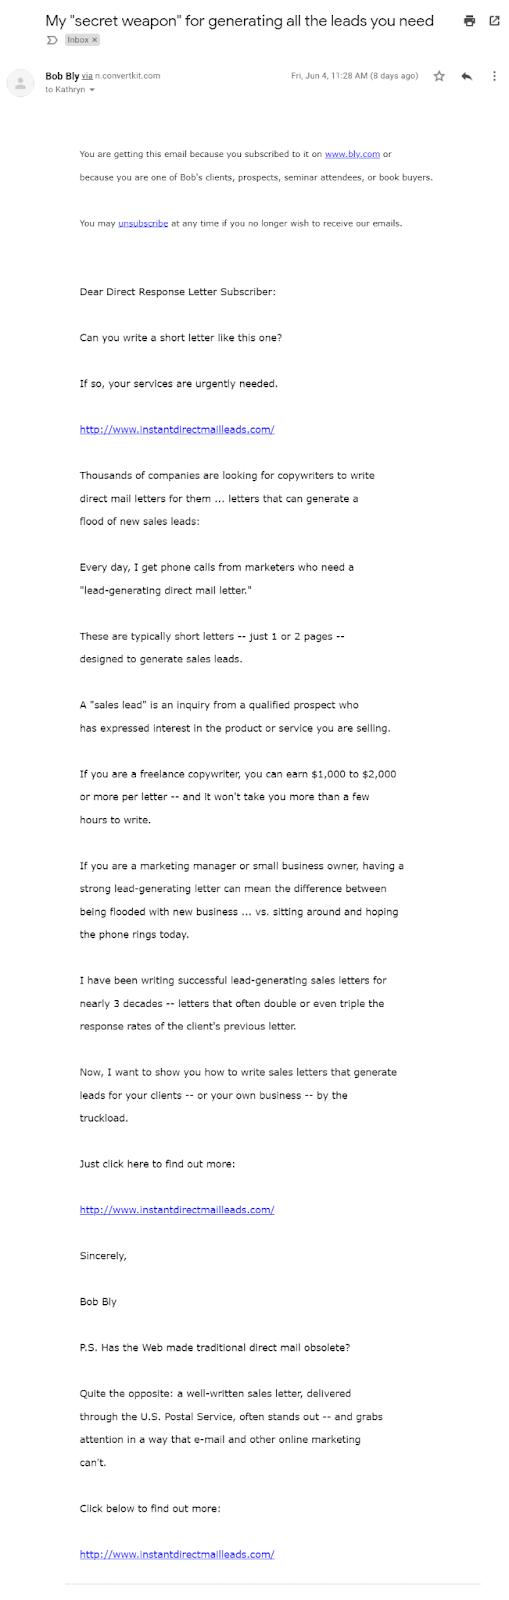 Screenshot Bob Bly's text based newsletter